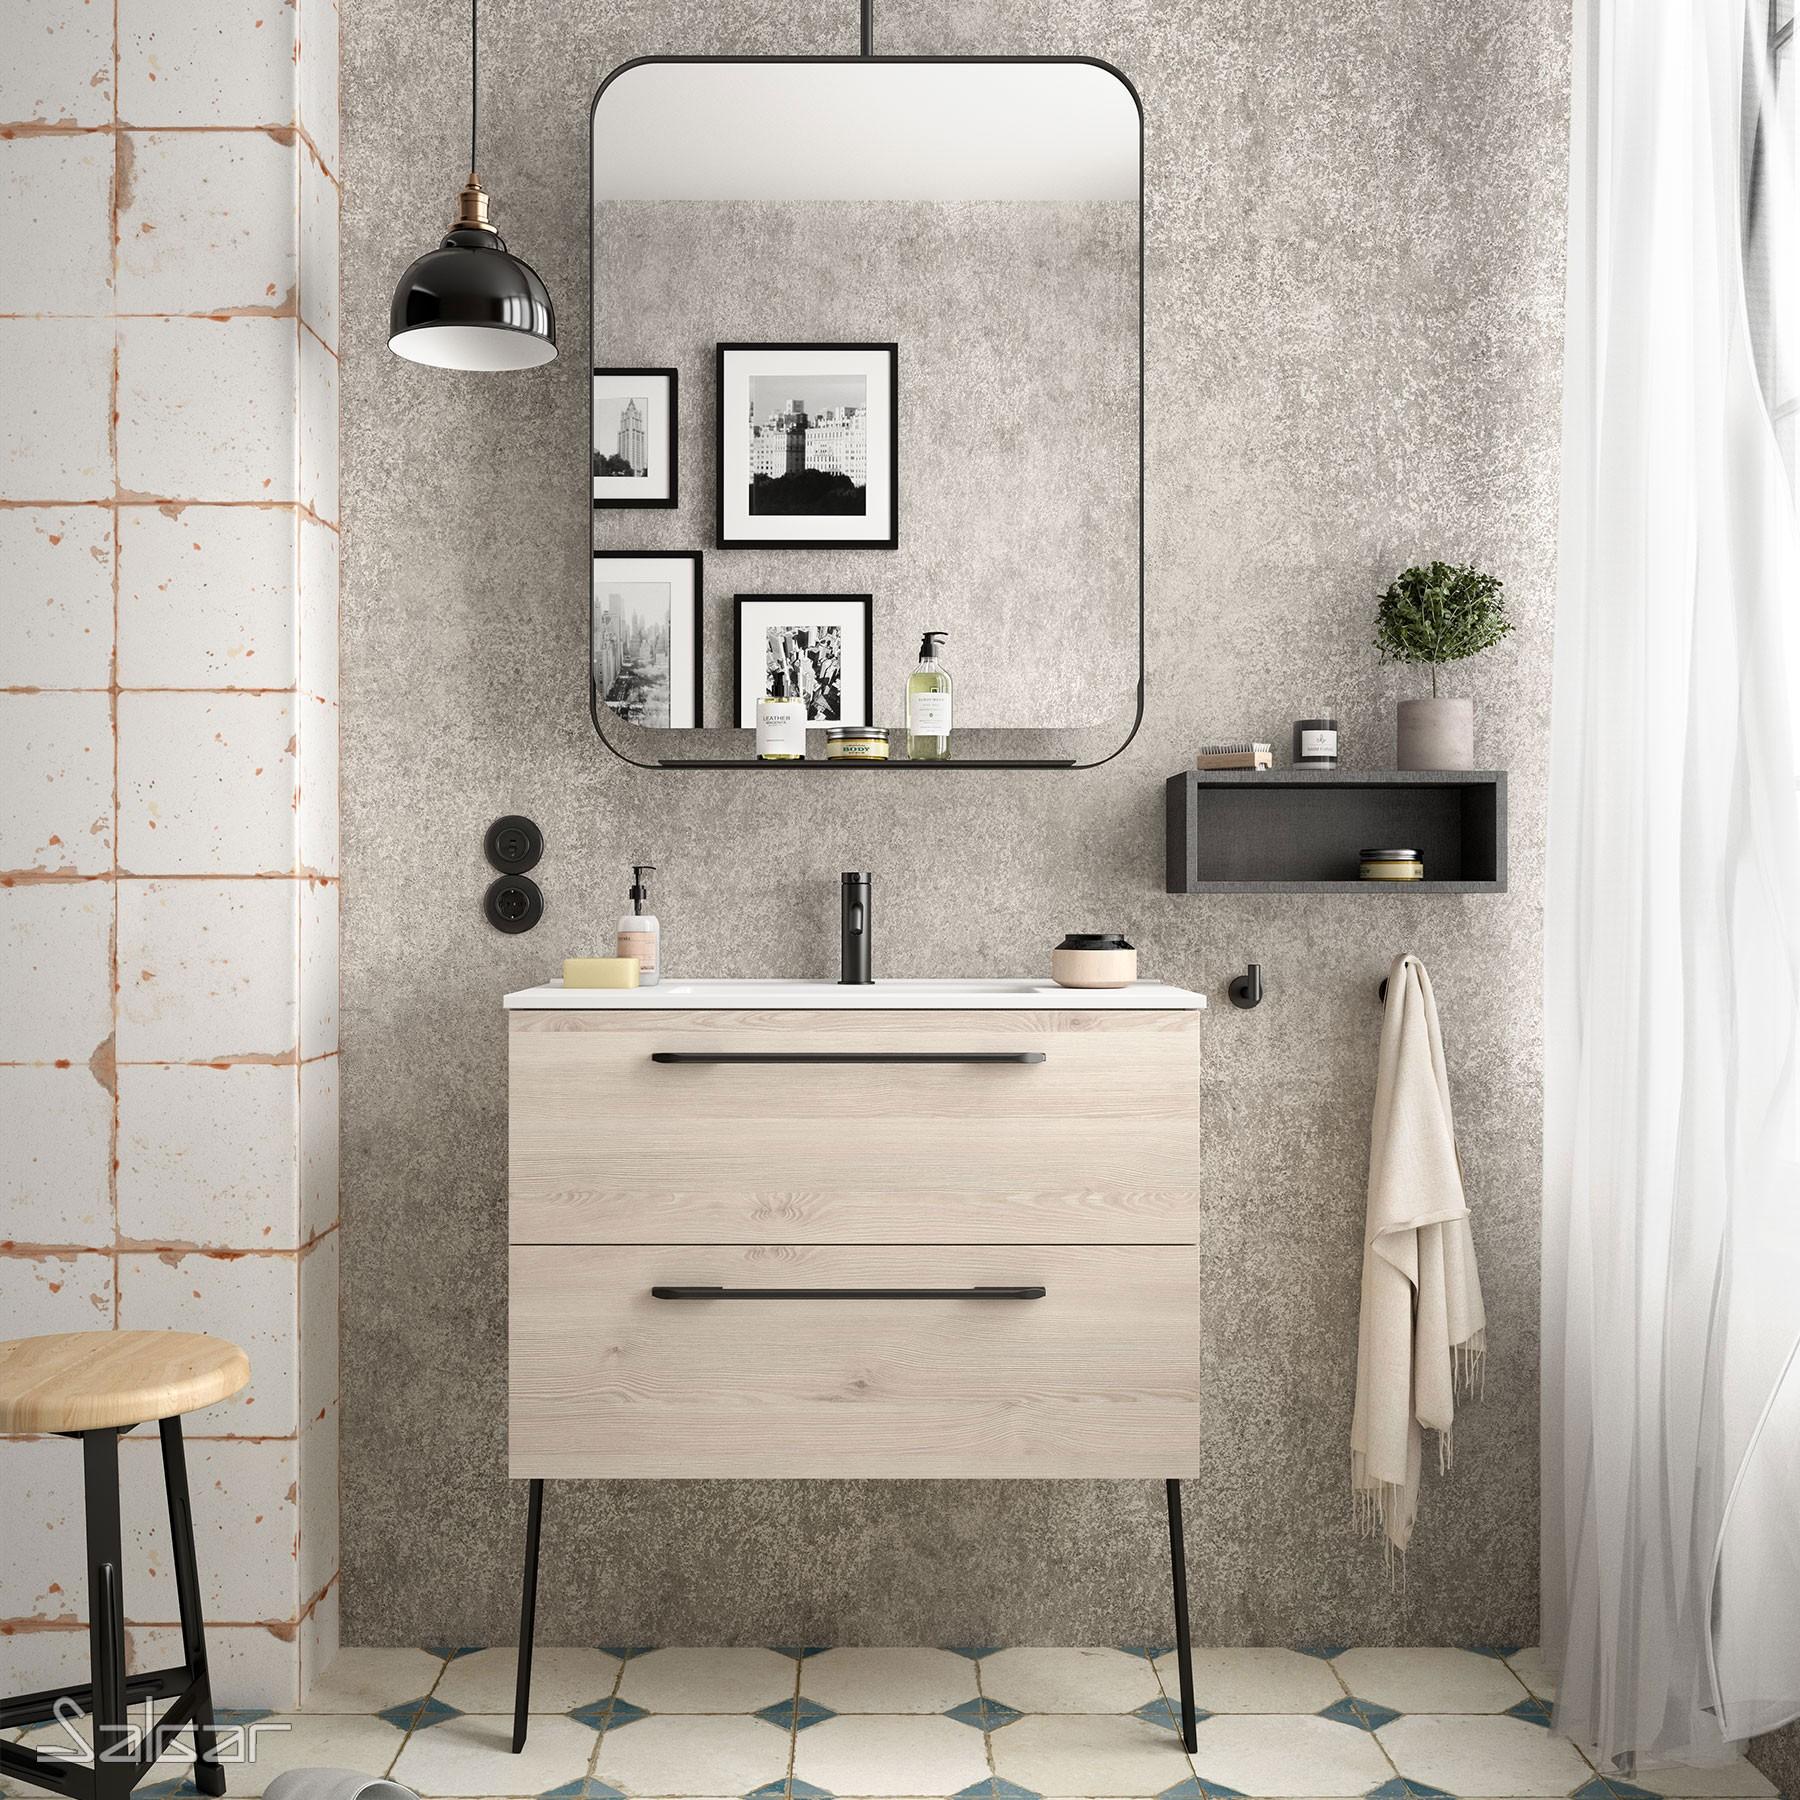 meuble s35 800 2 tiroirs chene naturel 797 x 540 x 346 mm